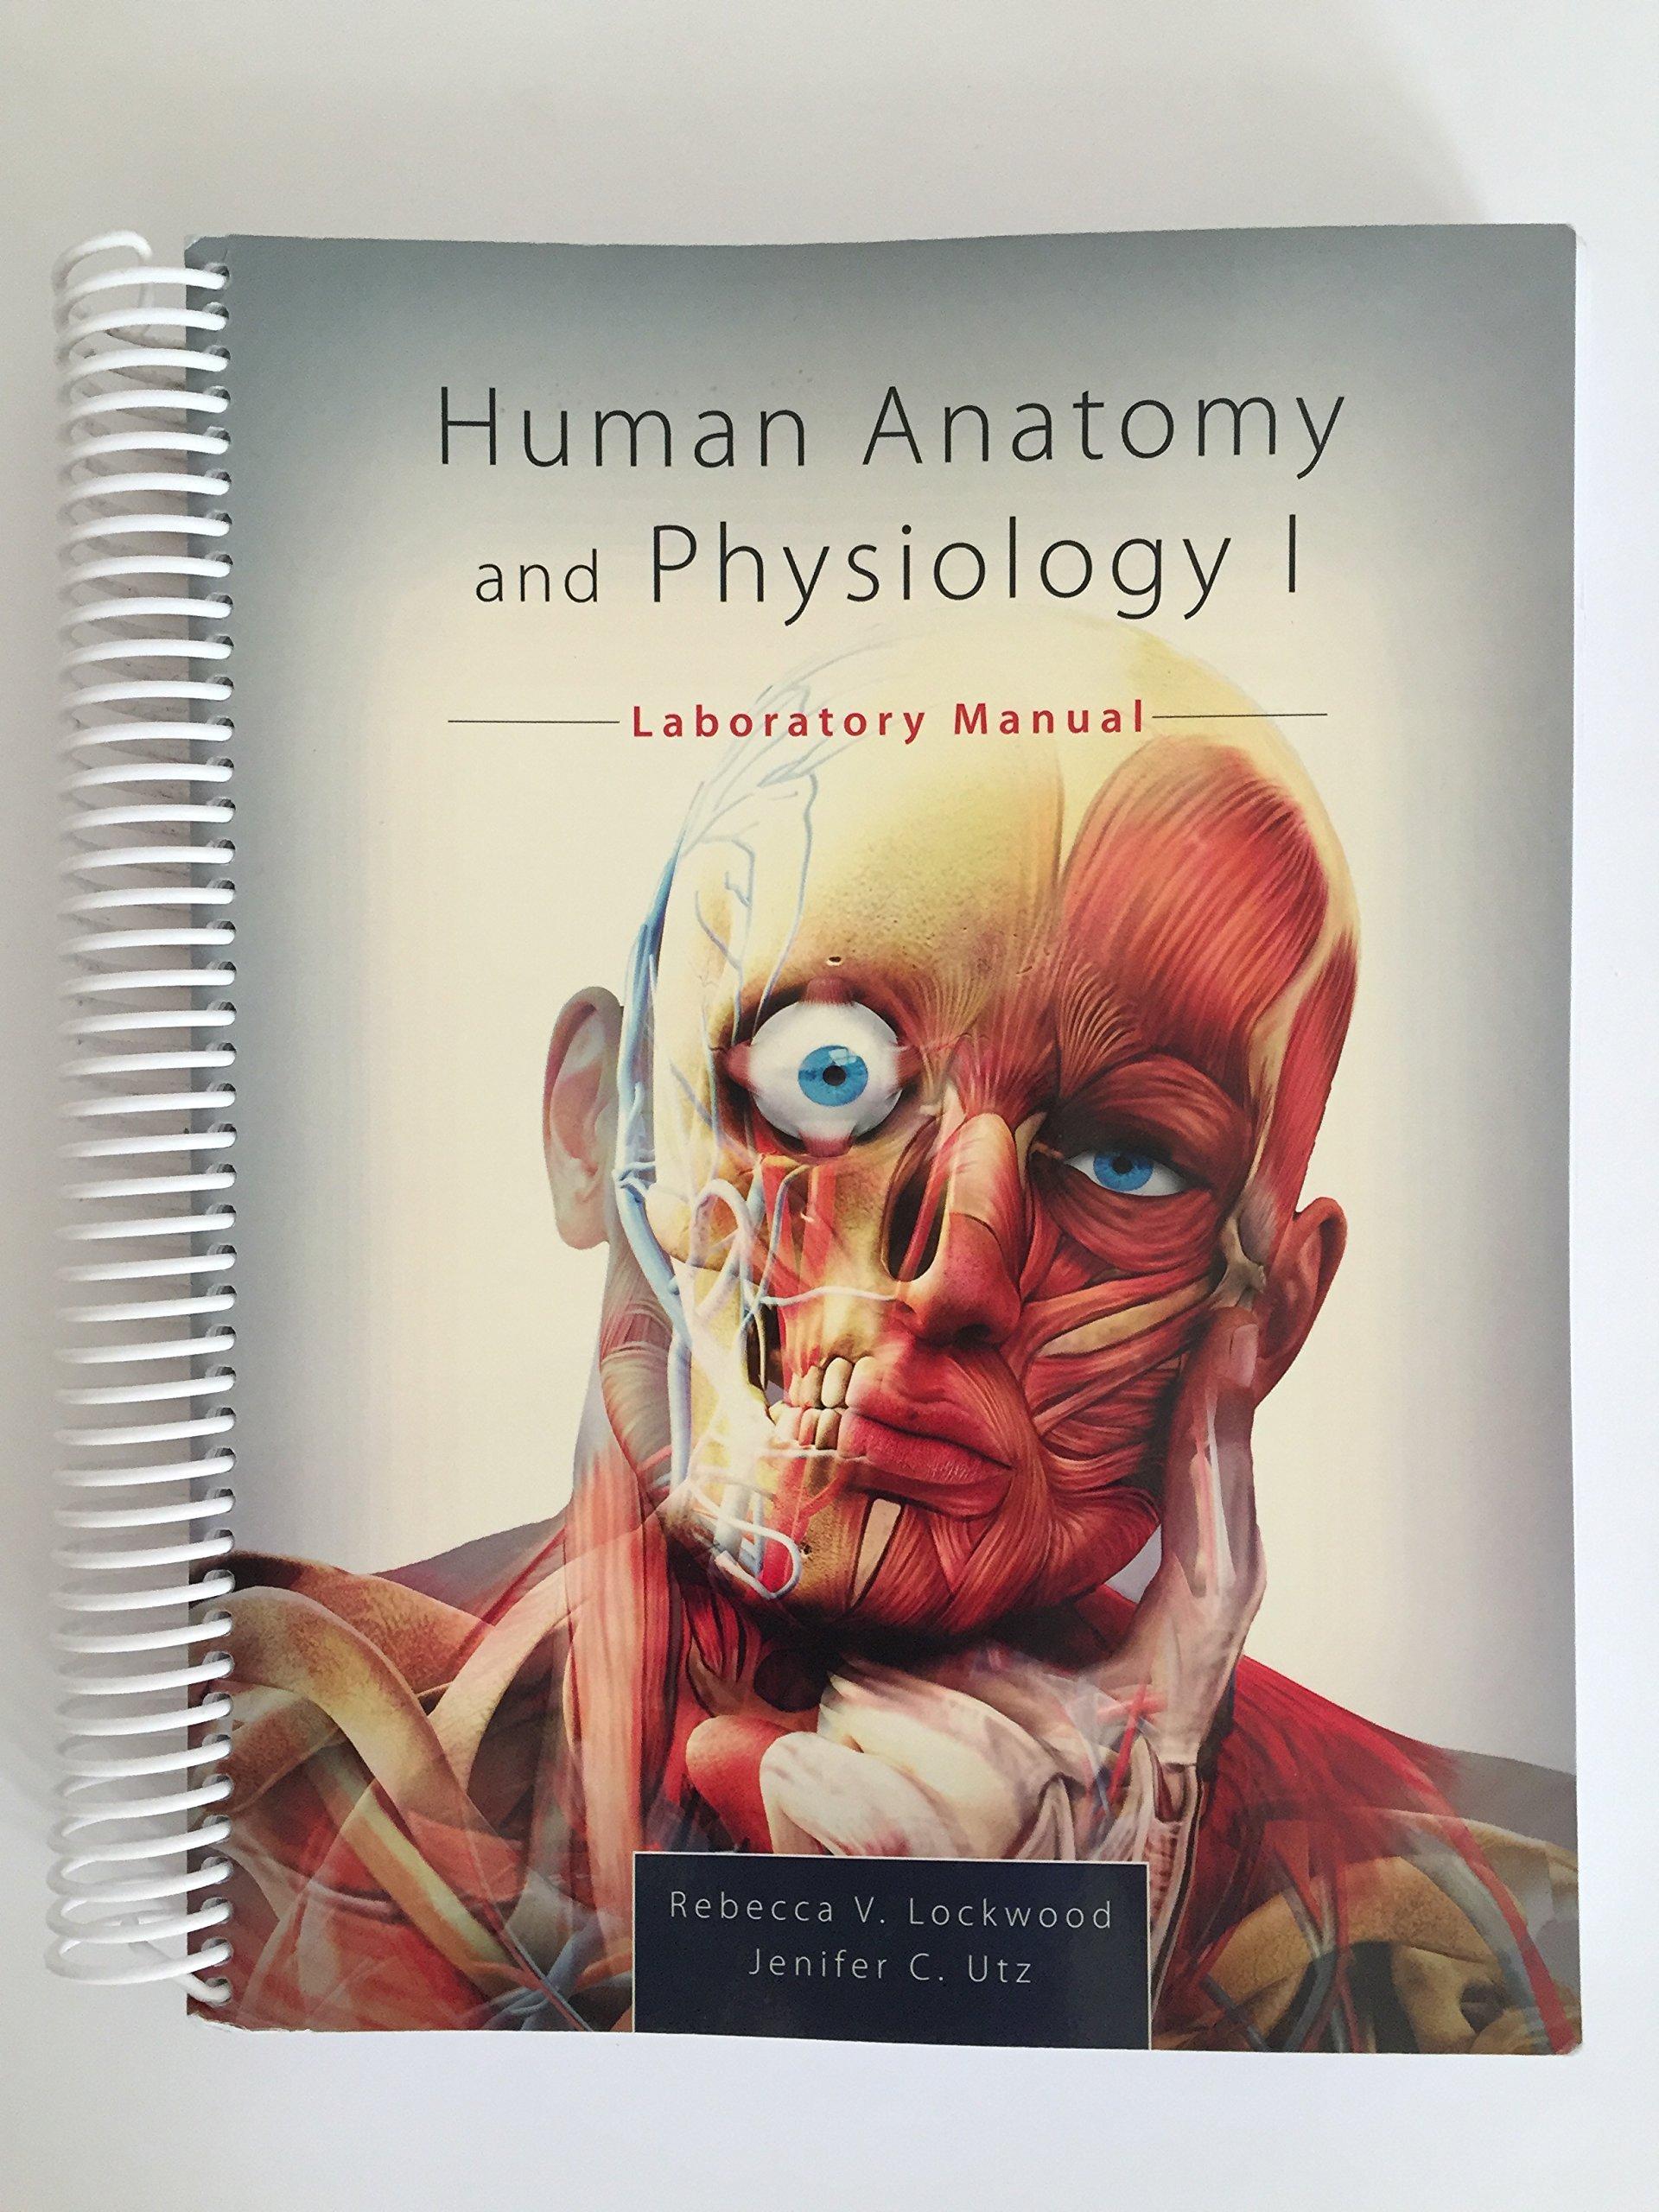 Human Anatomy and Physiology I Laboratory Manual: Rebecca V ...